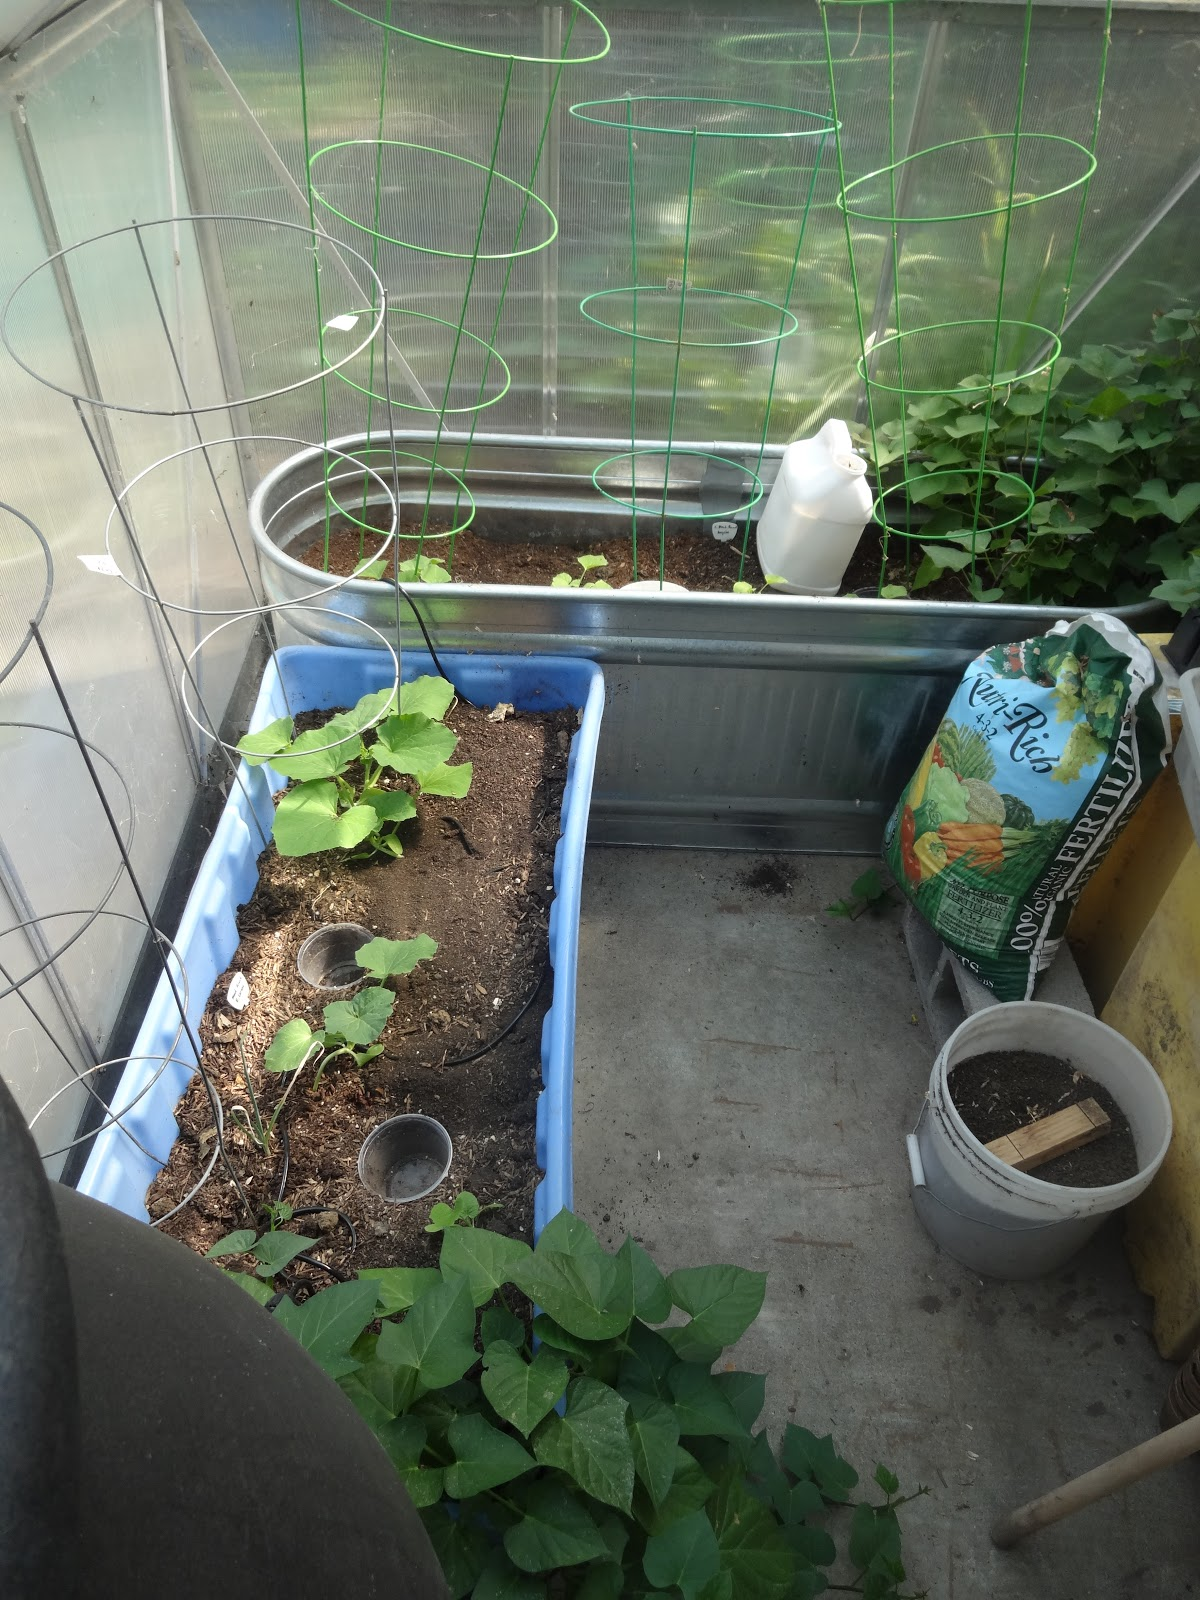 The Scientific Gardener: Purpose + Gardens on